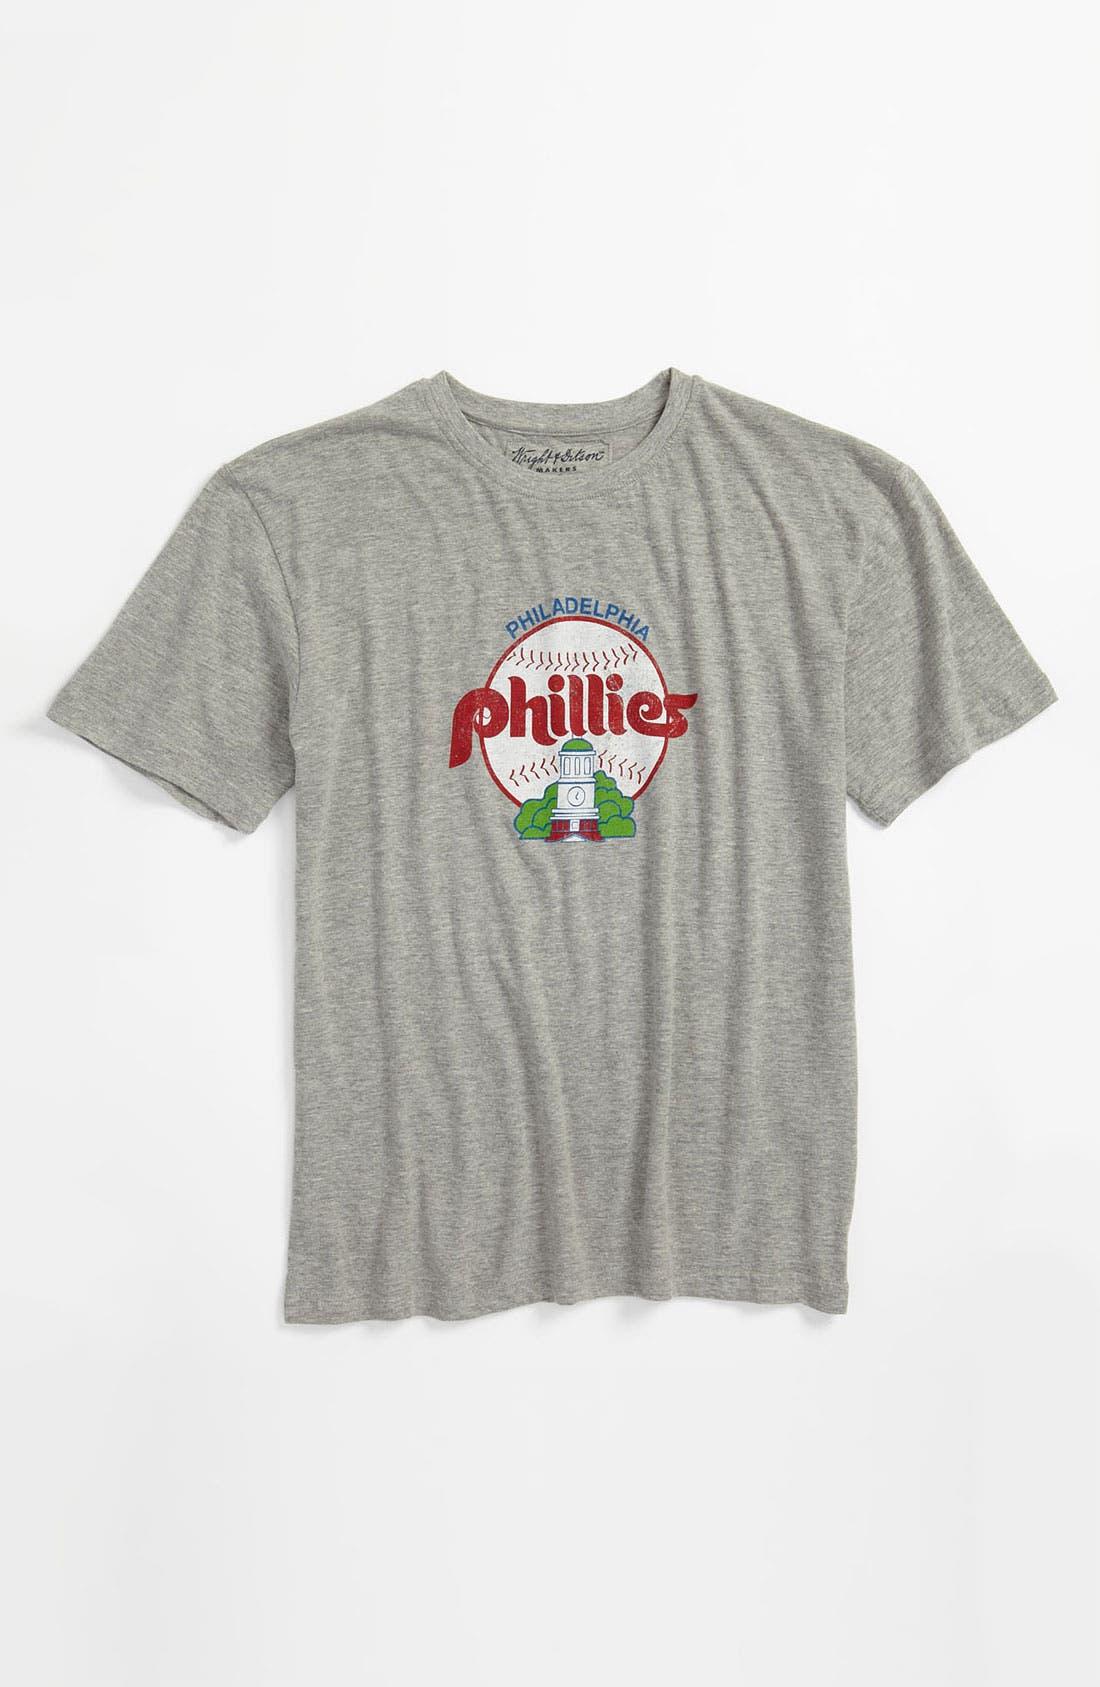 Alternate Image 1 Selected - Wright & Ditson 'Philadelphia Phillies' T-Shirt (Little Boys & Big Boys)